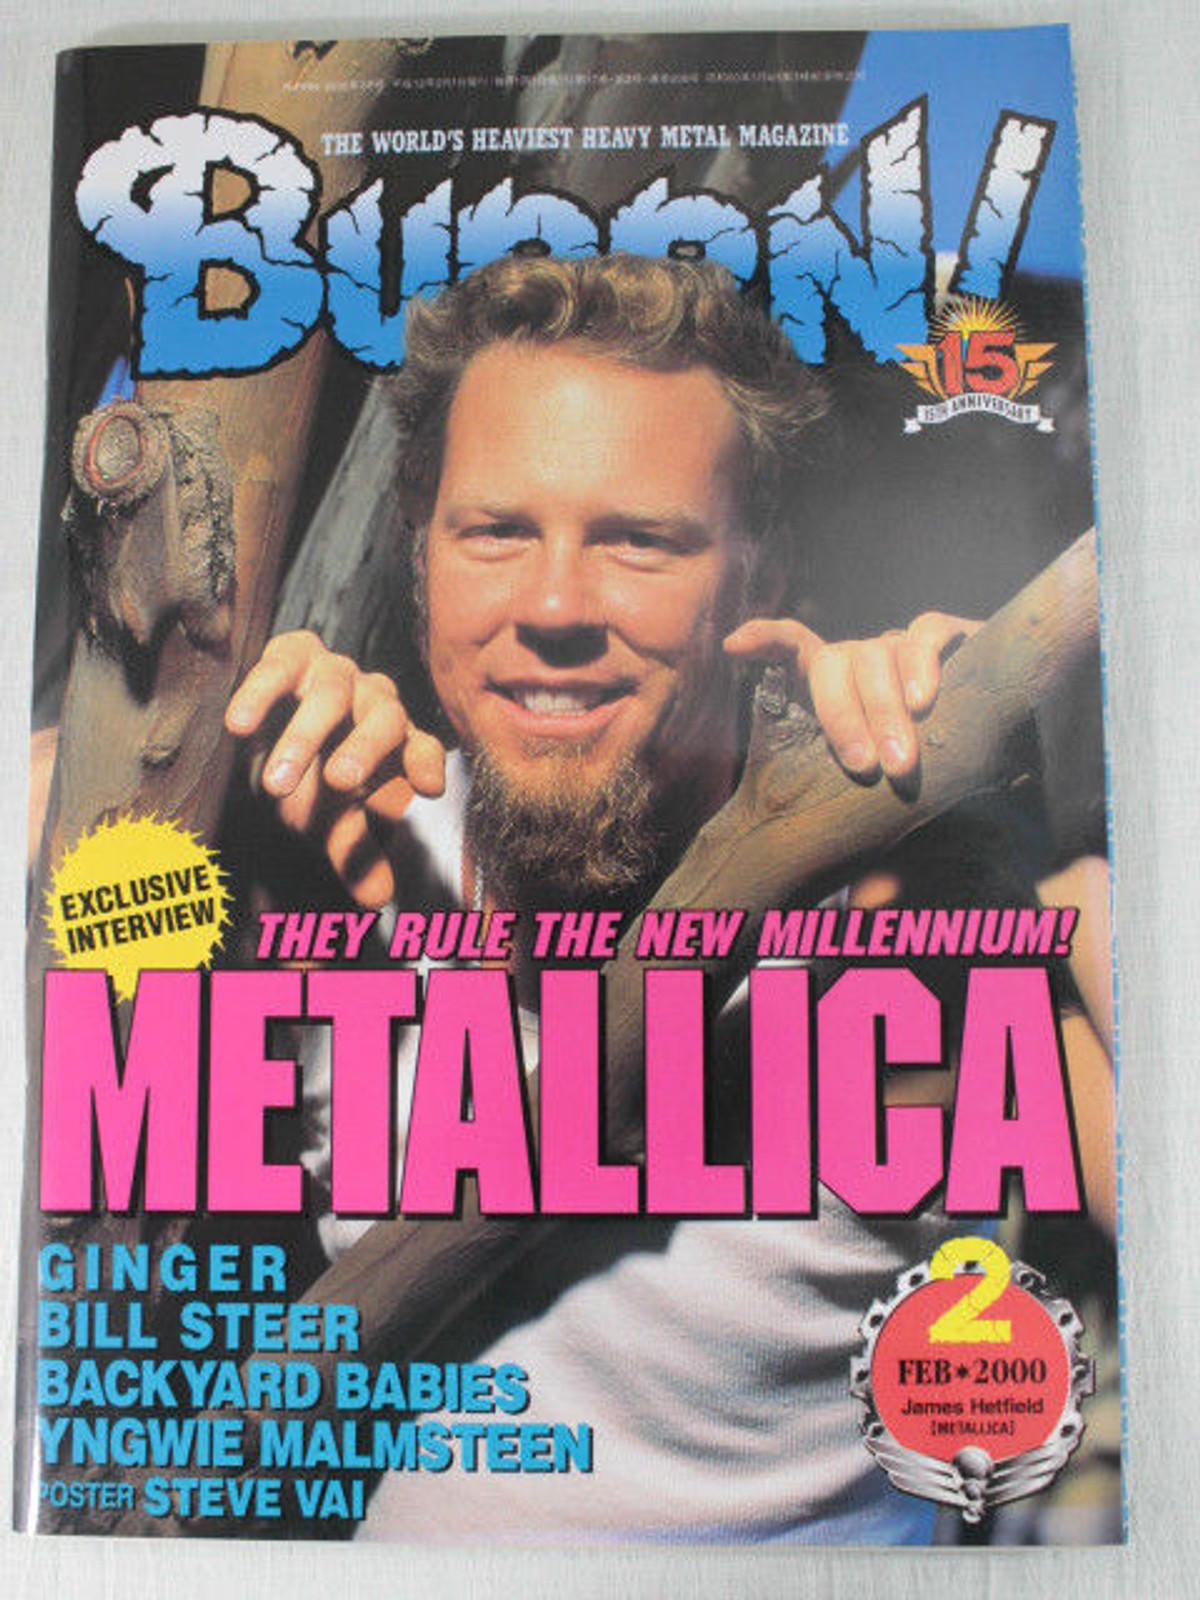 2000/02 BURRN! Japan Rock Magazine BACKYARD BABIES/VALENSIA/KORN